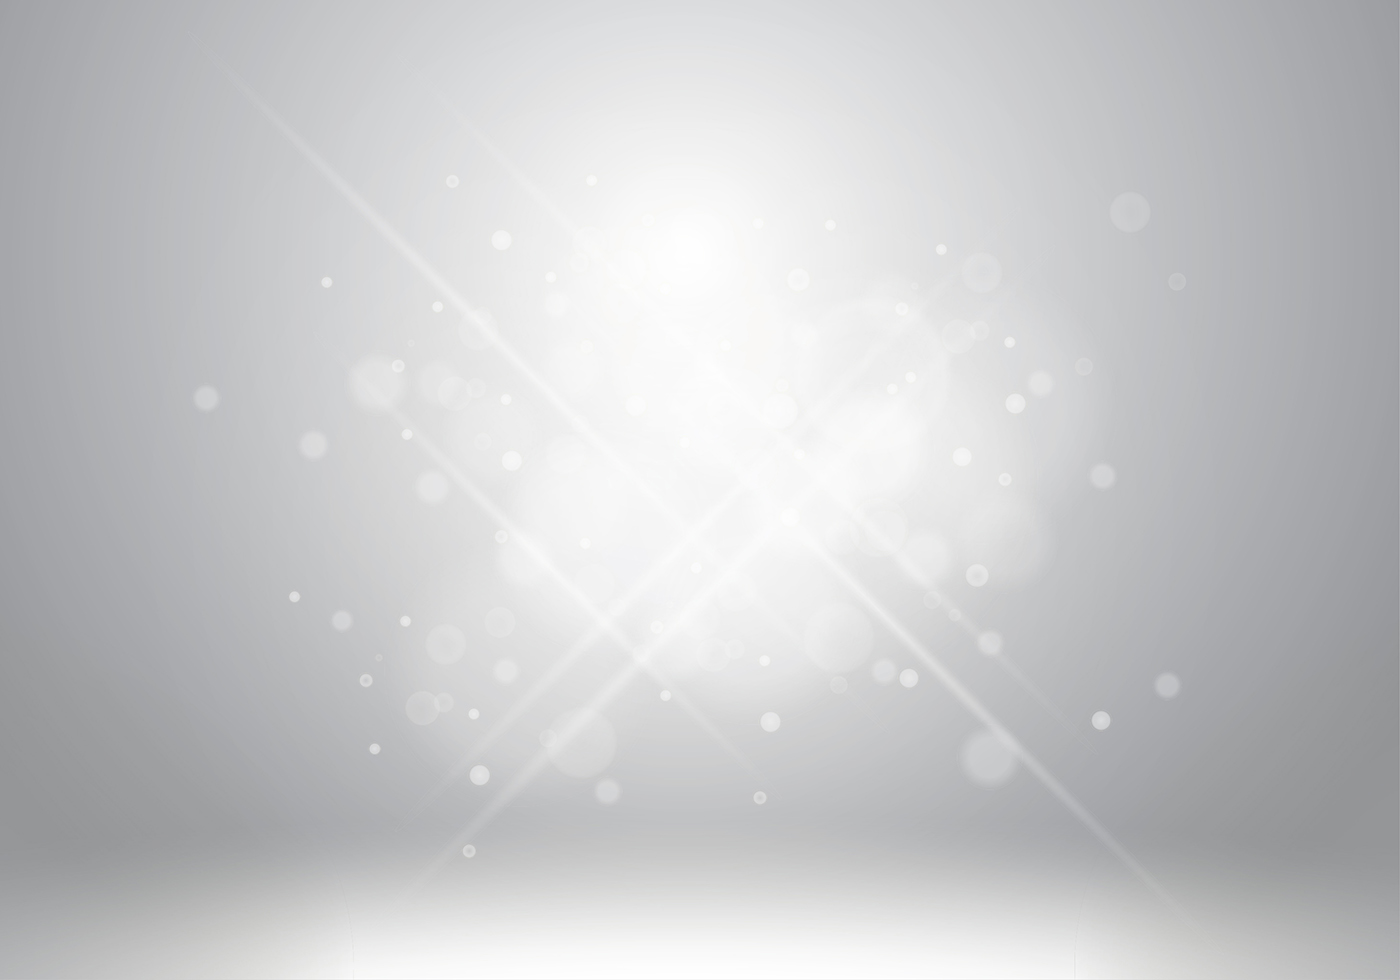 Grey Gradient Background Shiny Free Vector